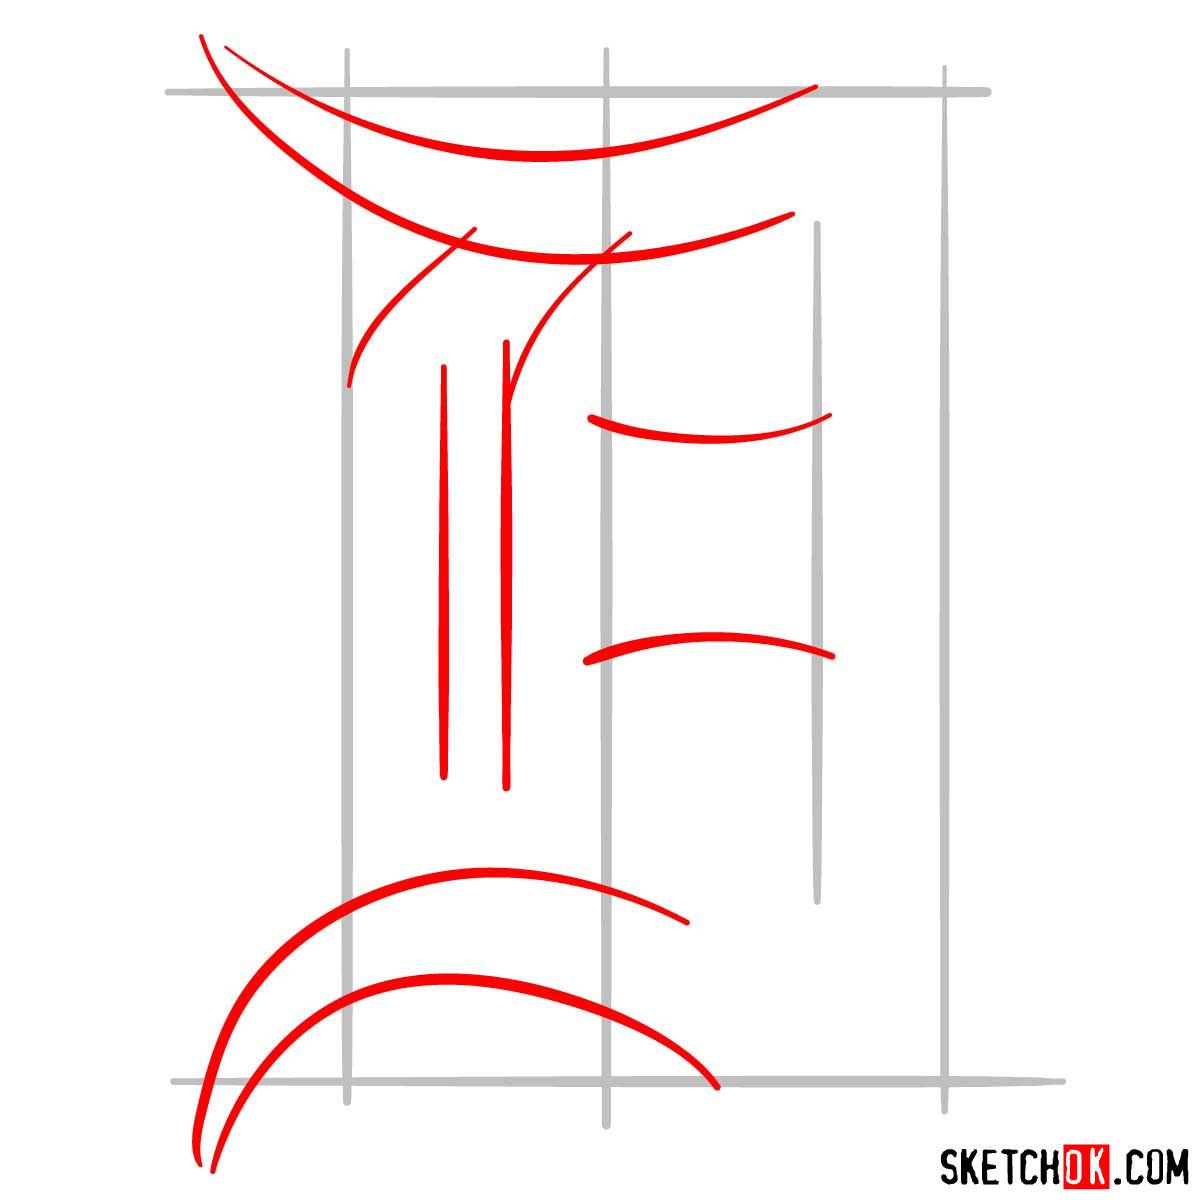 How to draw Detroit Tigers logo | MLB logos - step 02